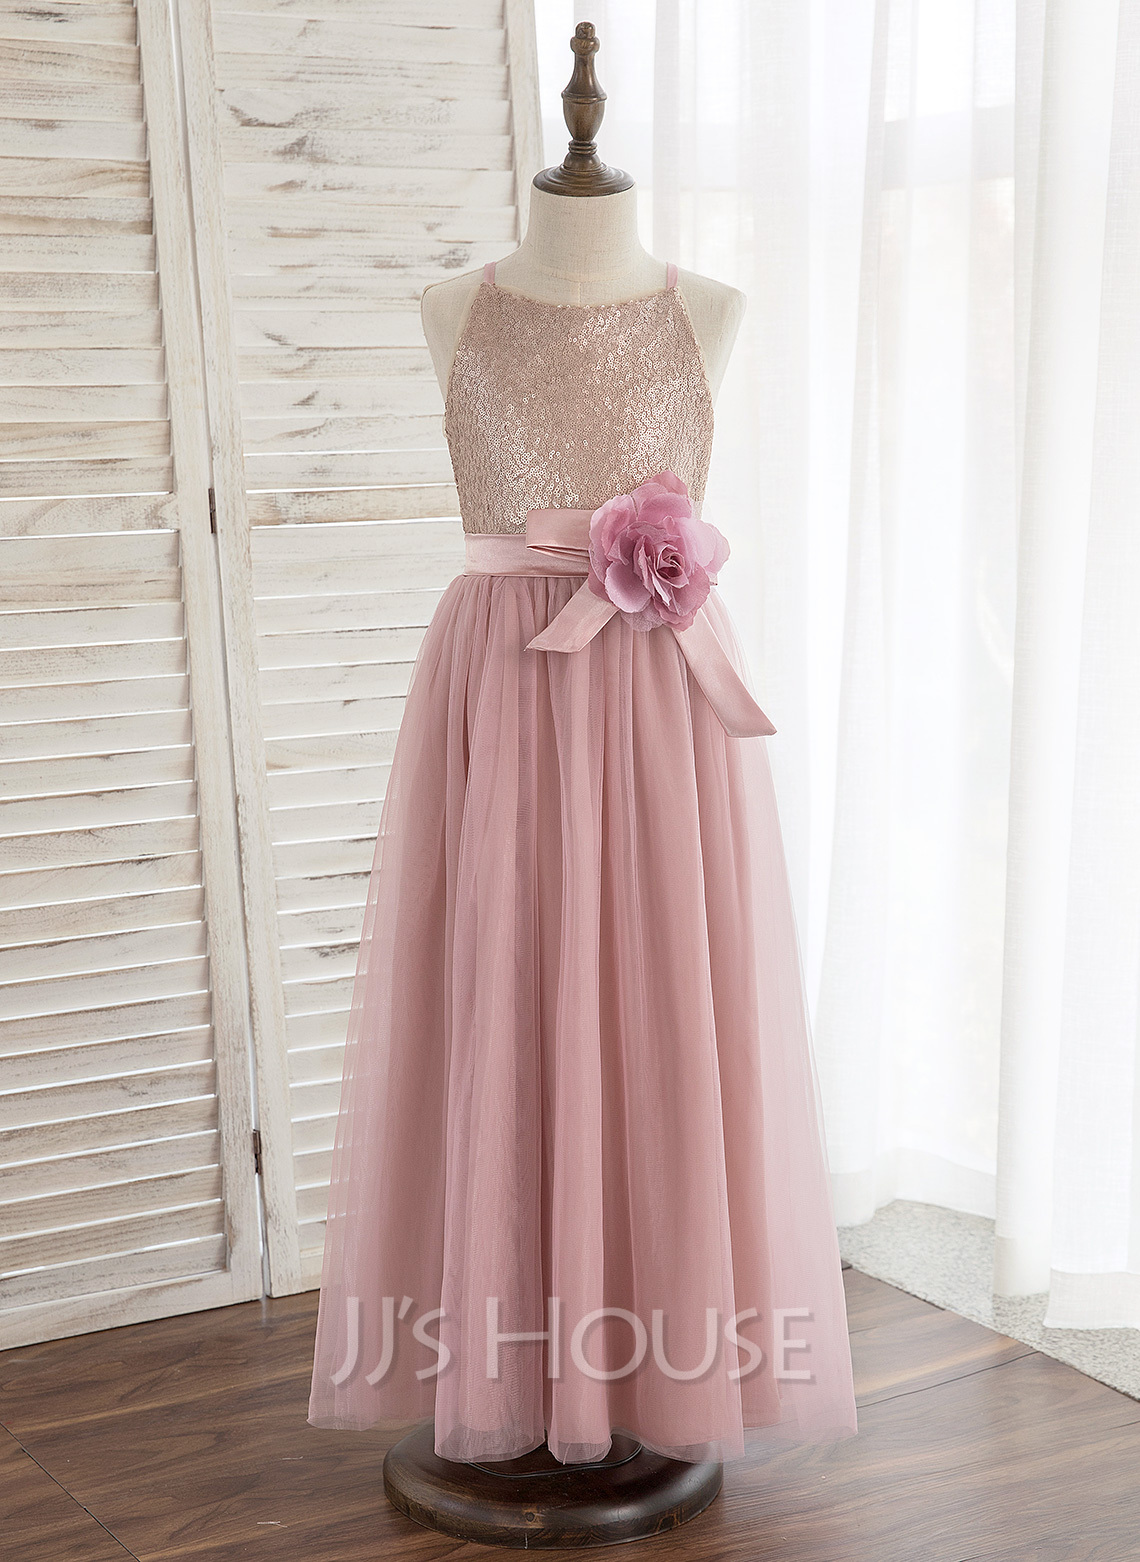 A-Line Ankle-length Flower Girl Dress - Tulle/Sequined Sleeveless Halter With Flower(s)